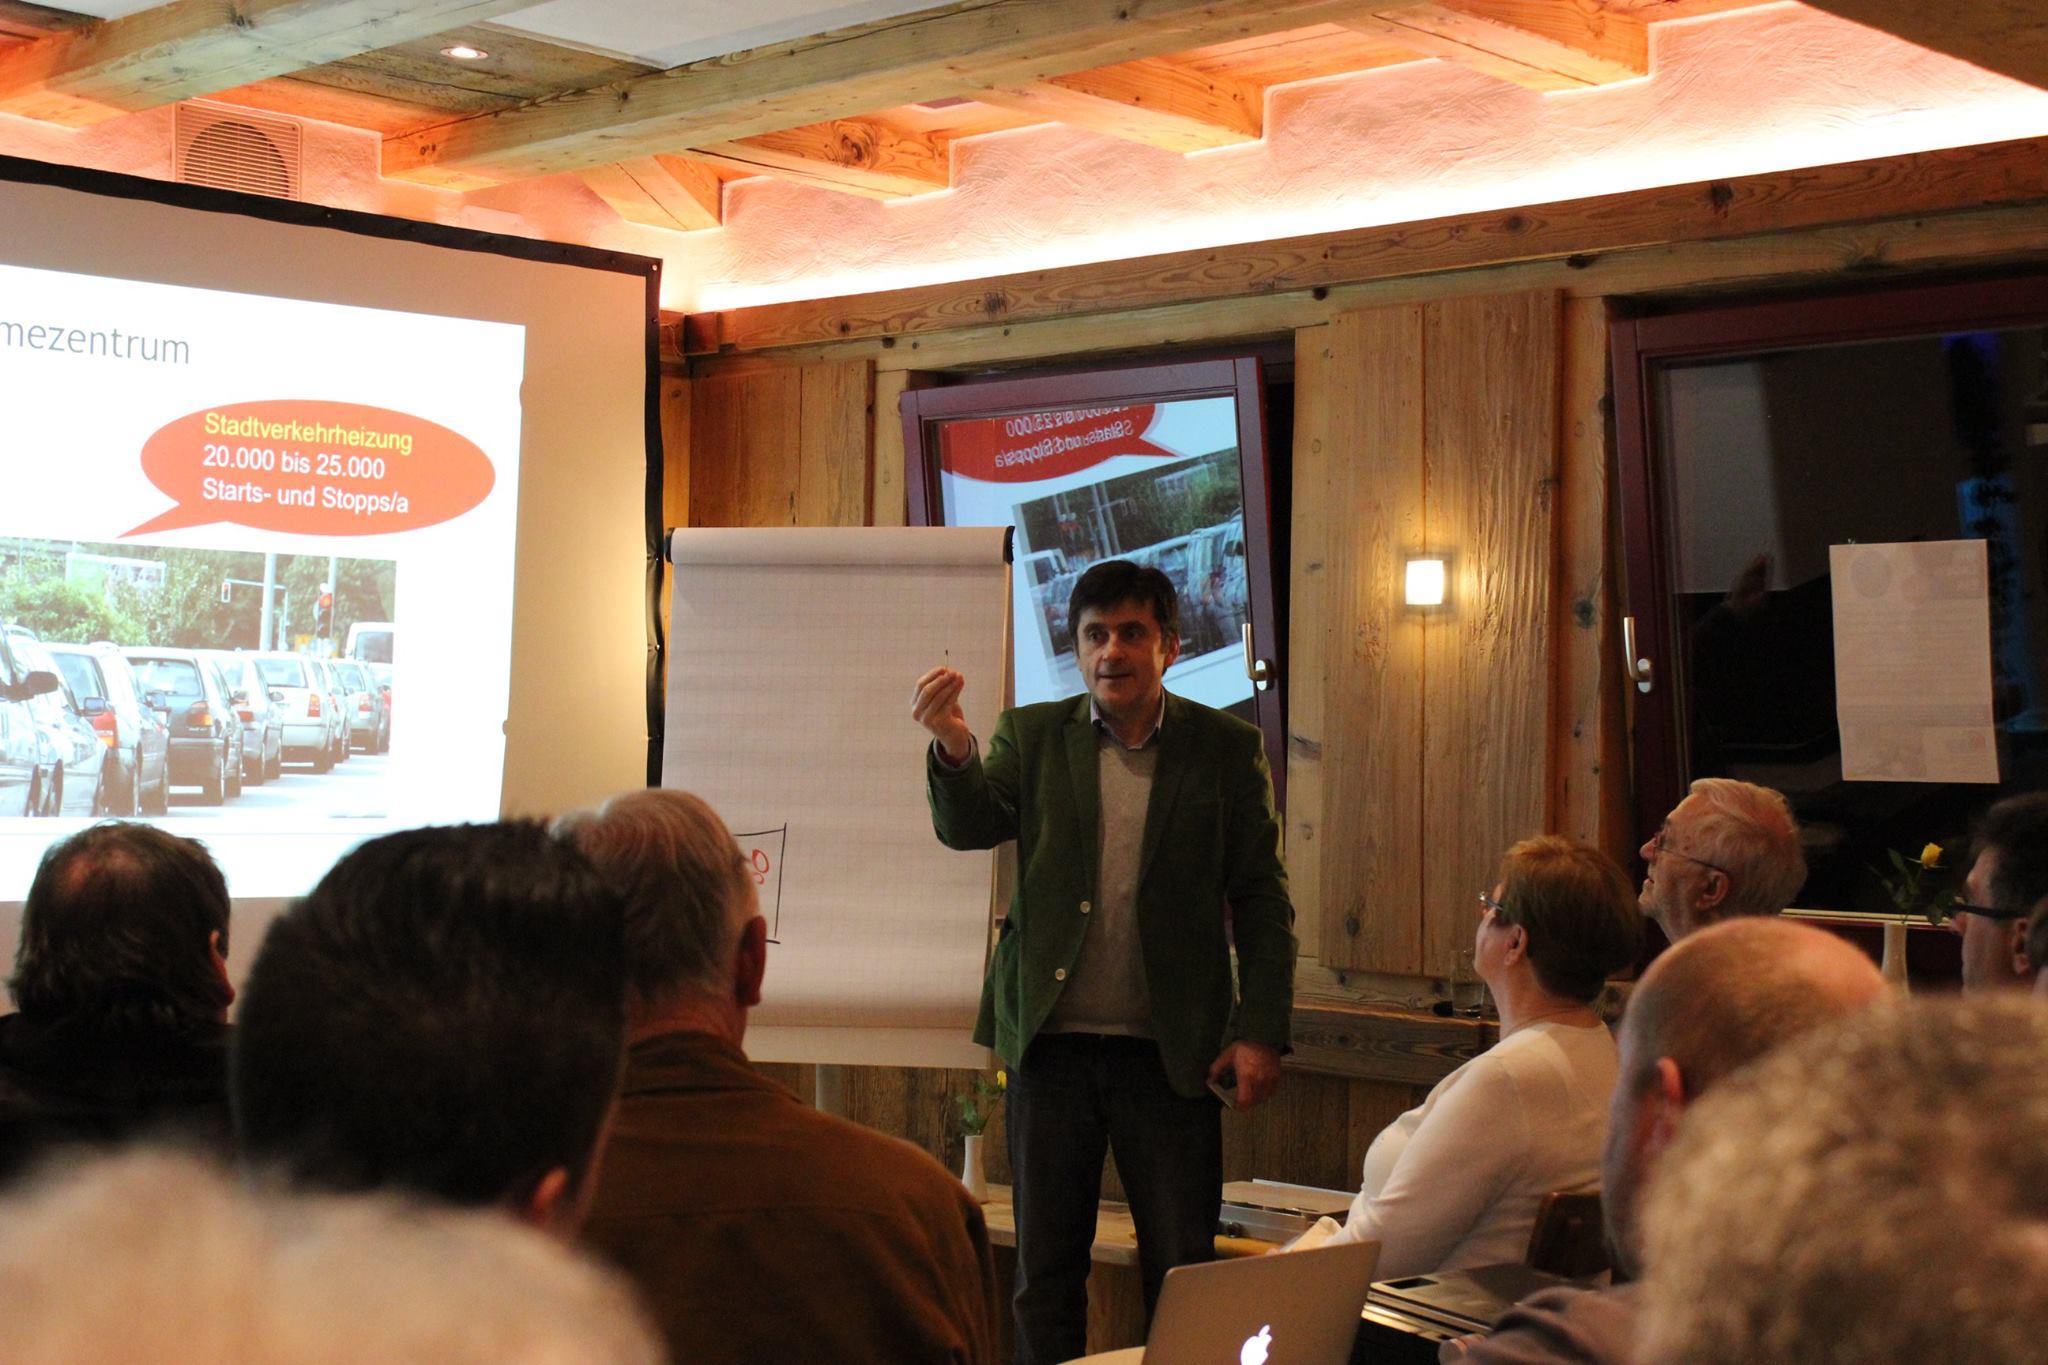 seminarhaus-schloessle-seminar-heiztechnik